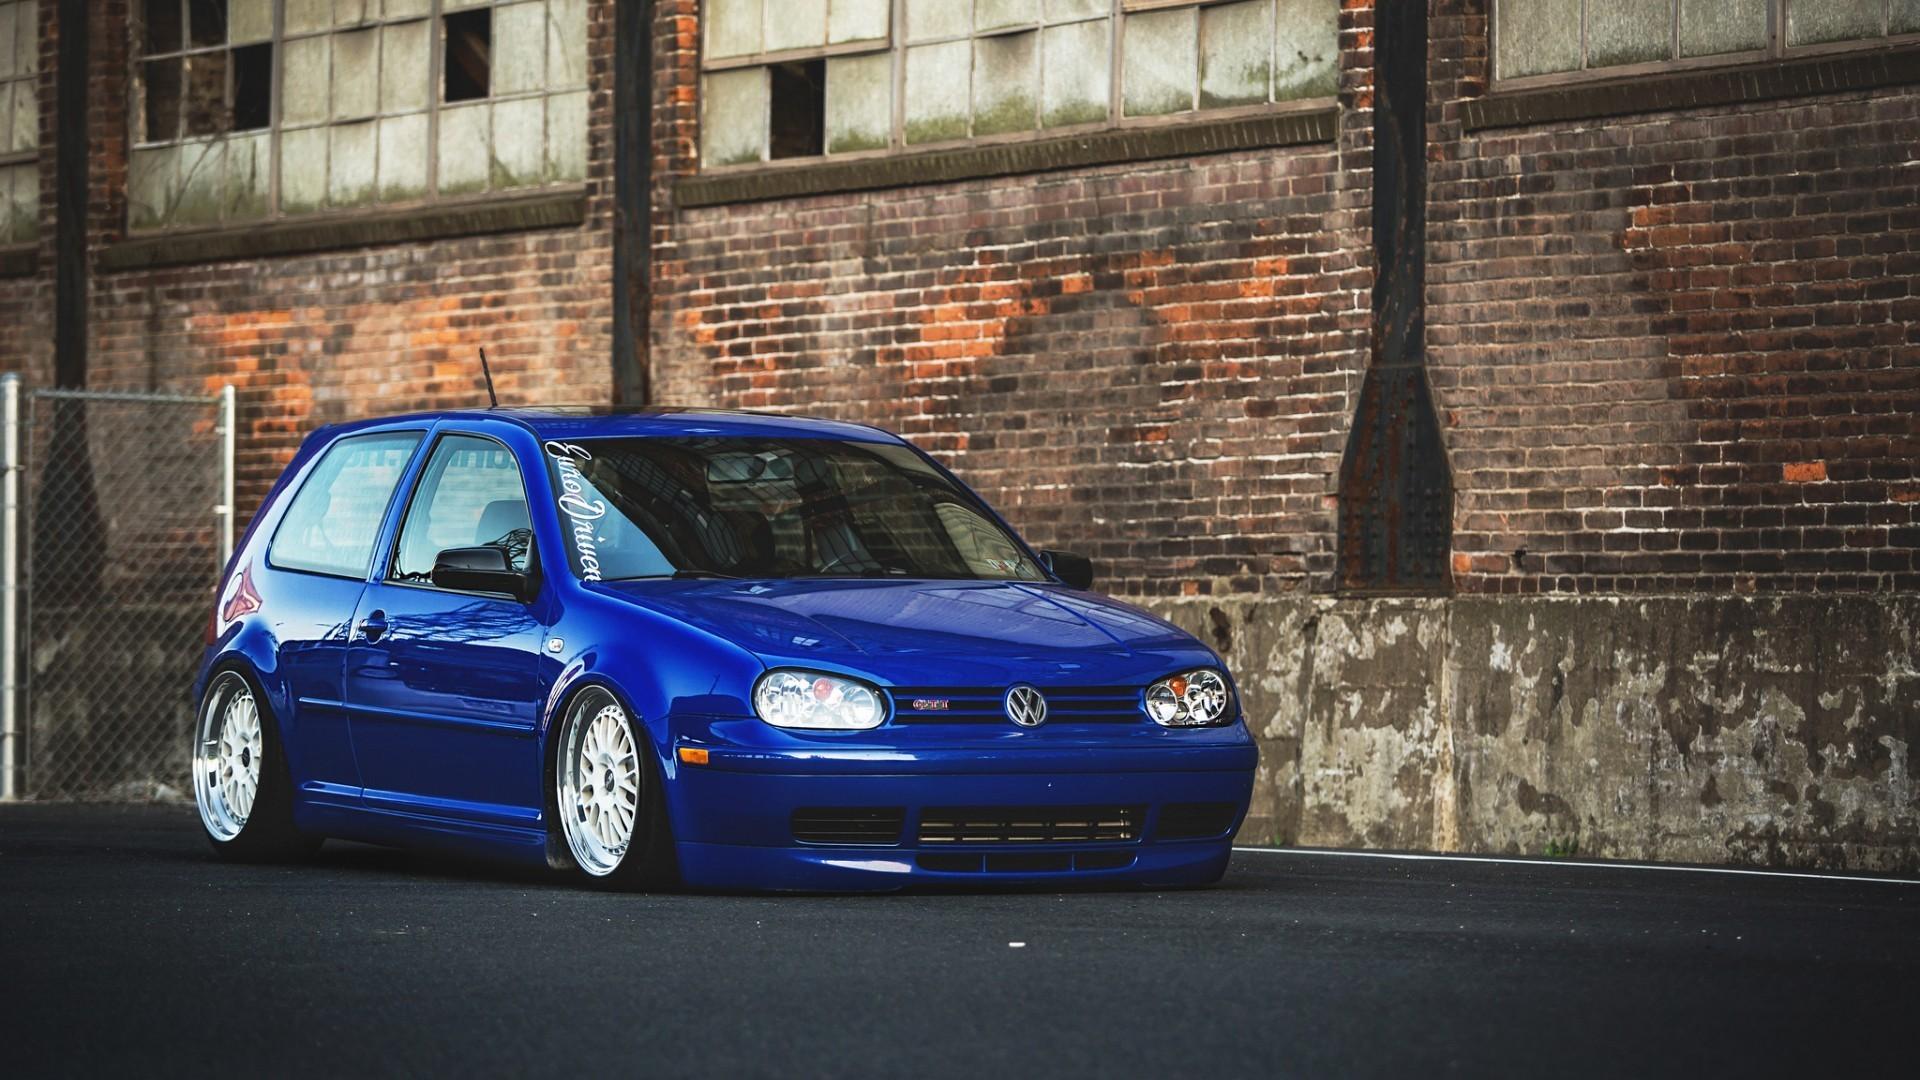 Volkswagen, Golf IV, GTI Wallpapers HD / Desktop and Mobile Backgrounds